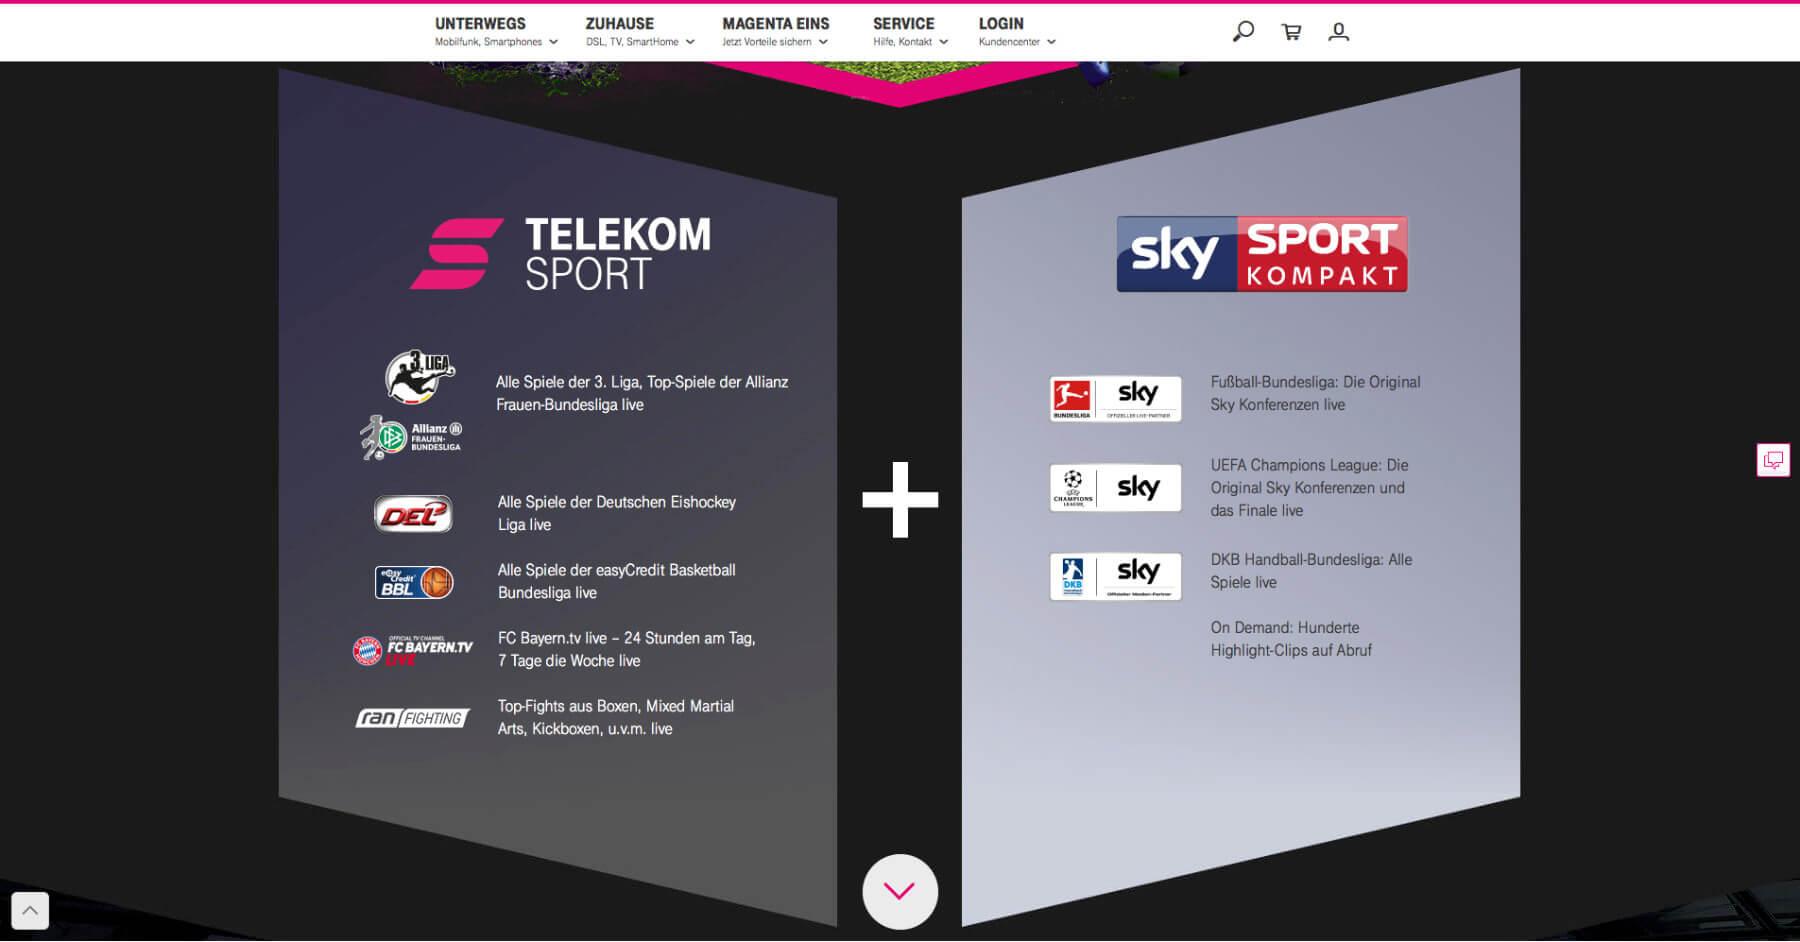 telekom sportpaket sport events live per stream app und smart tv. Black Bedroom Furniture Sets. Home Design Ideas